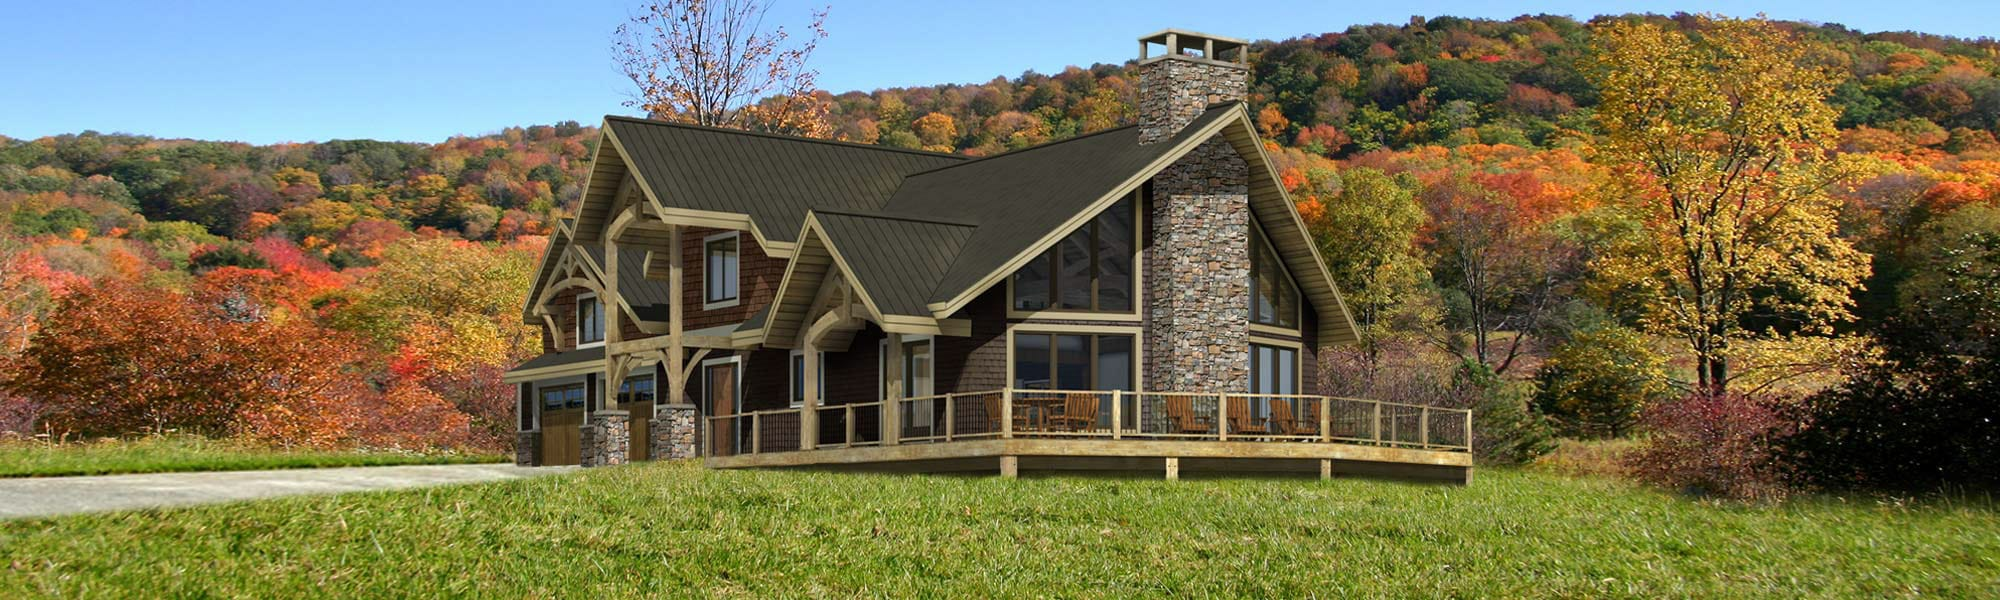 Mayson mountain timber floor plan